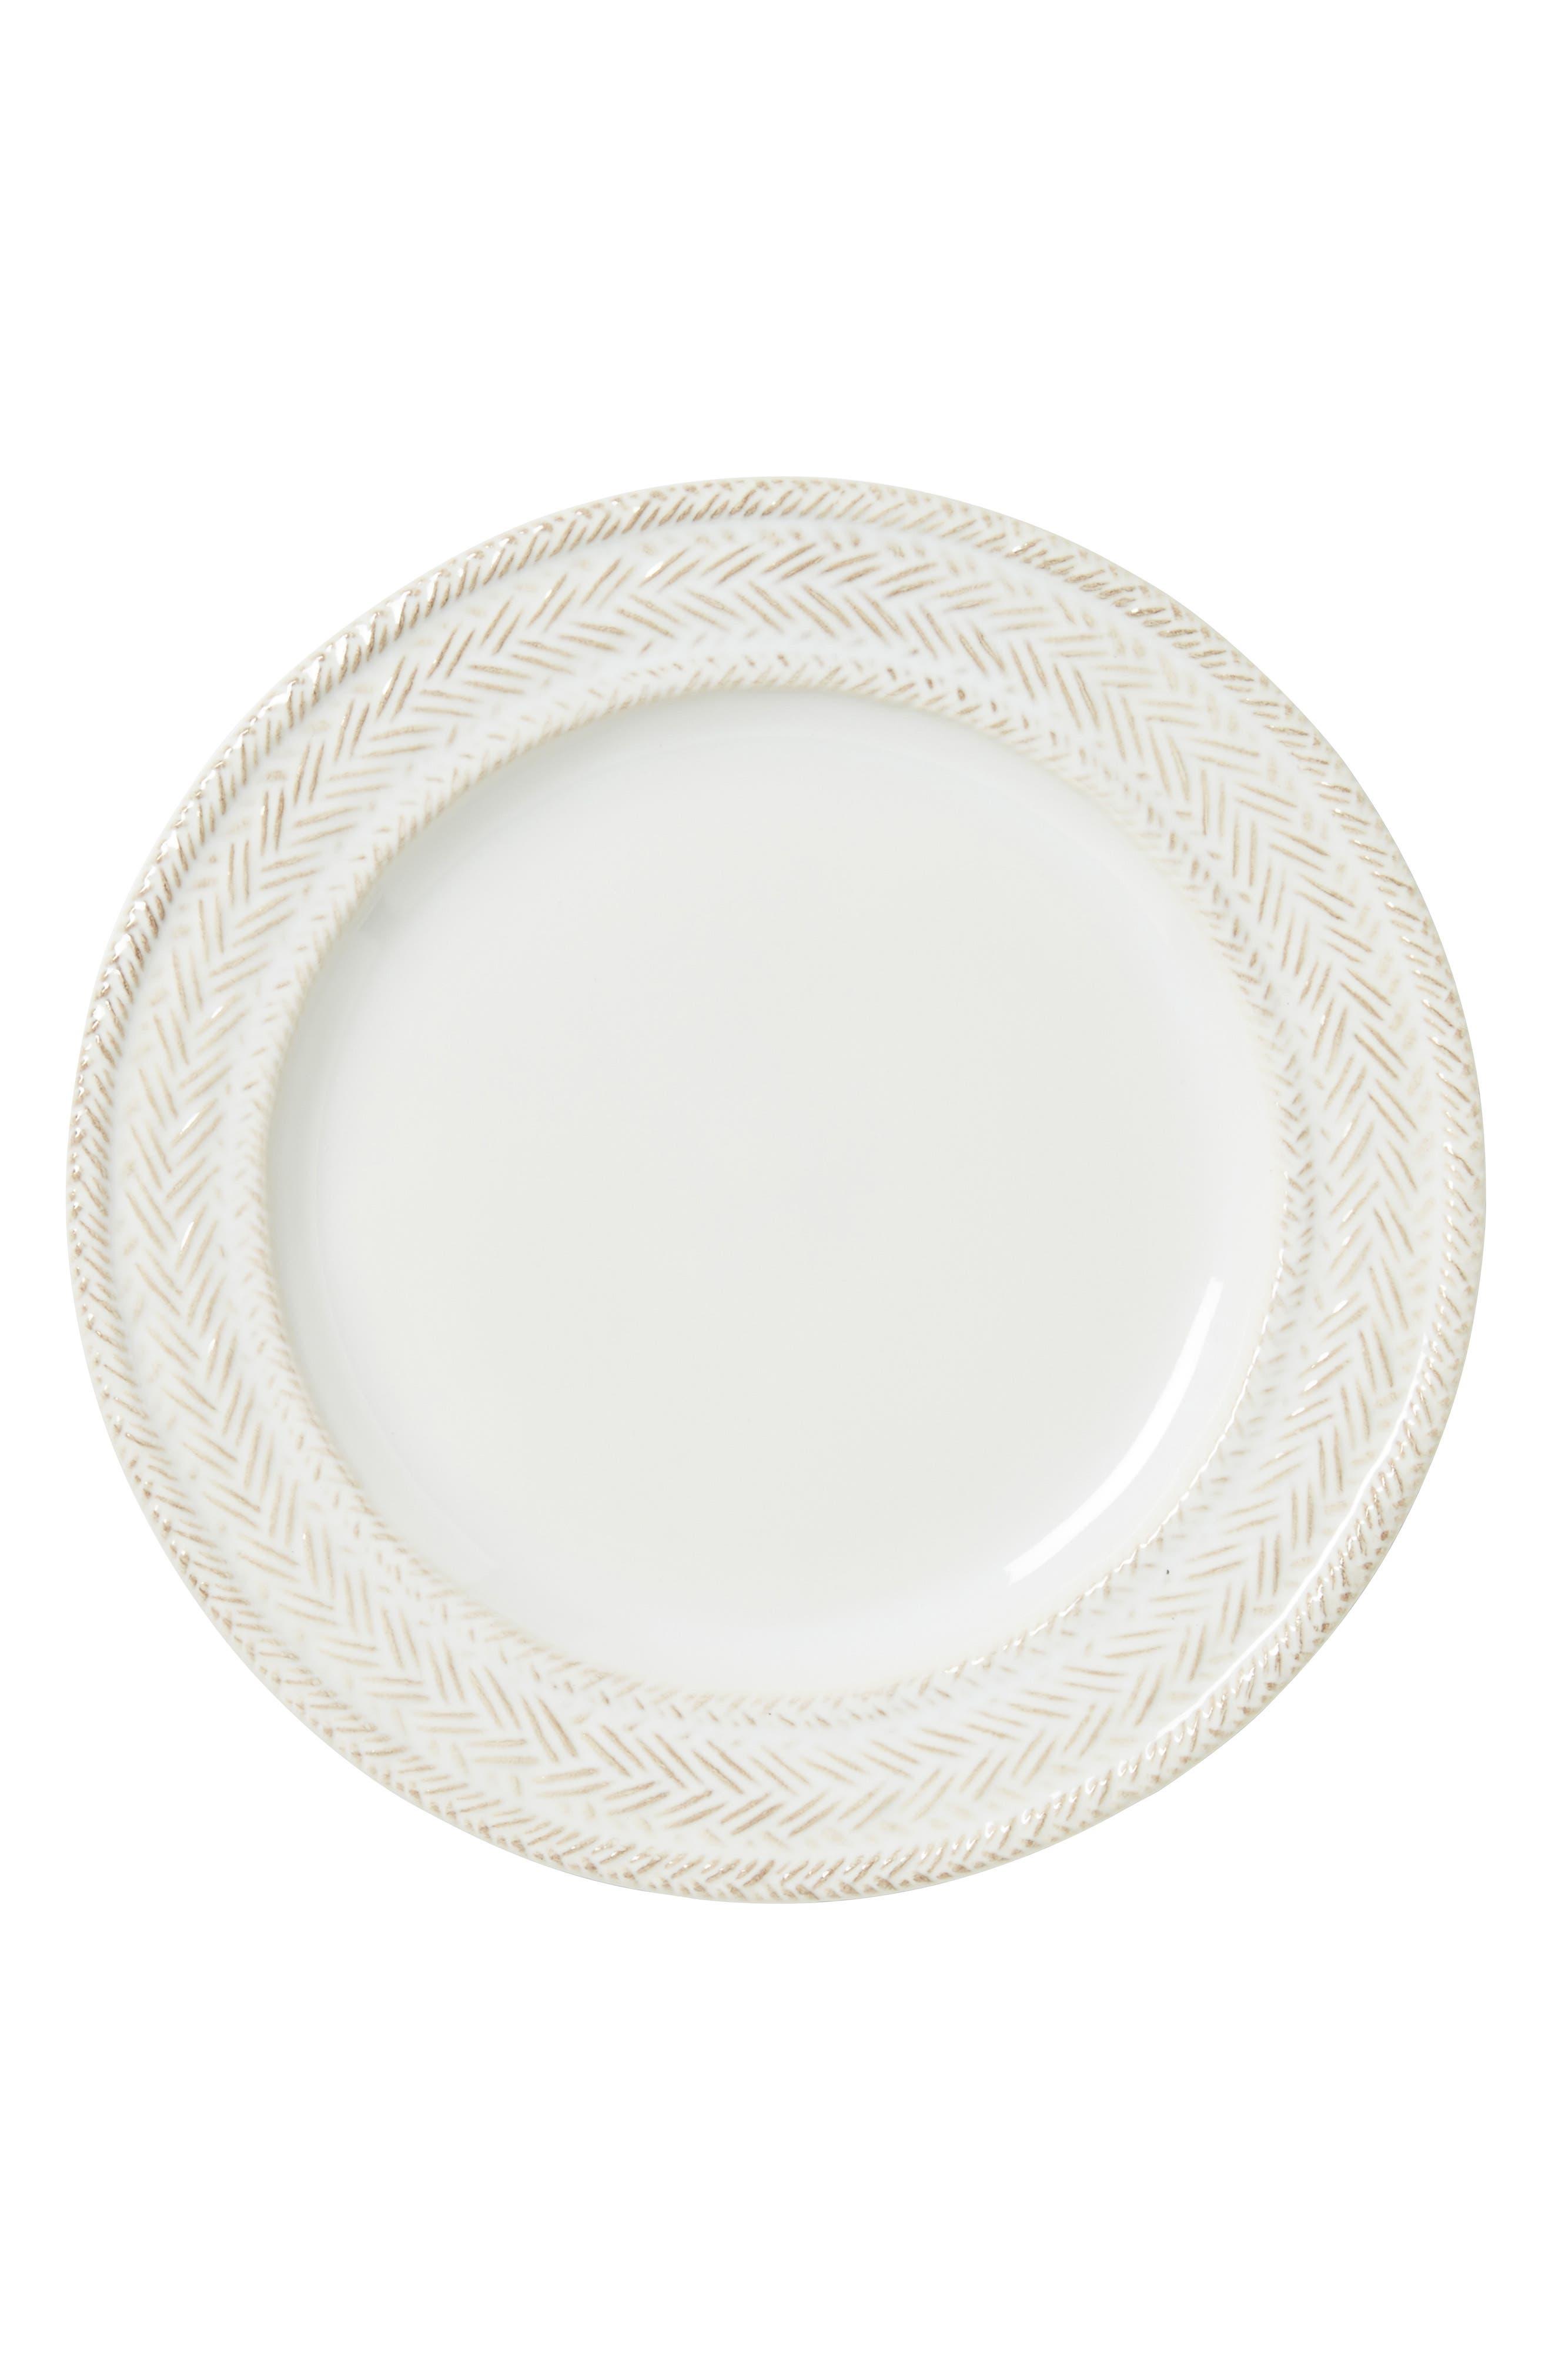 Le Panier Ceramic Salad Plate,                             Main thumbnail 1, color,                             WHITEWASH